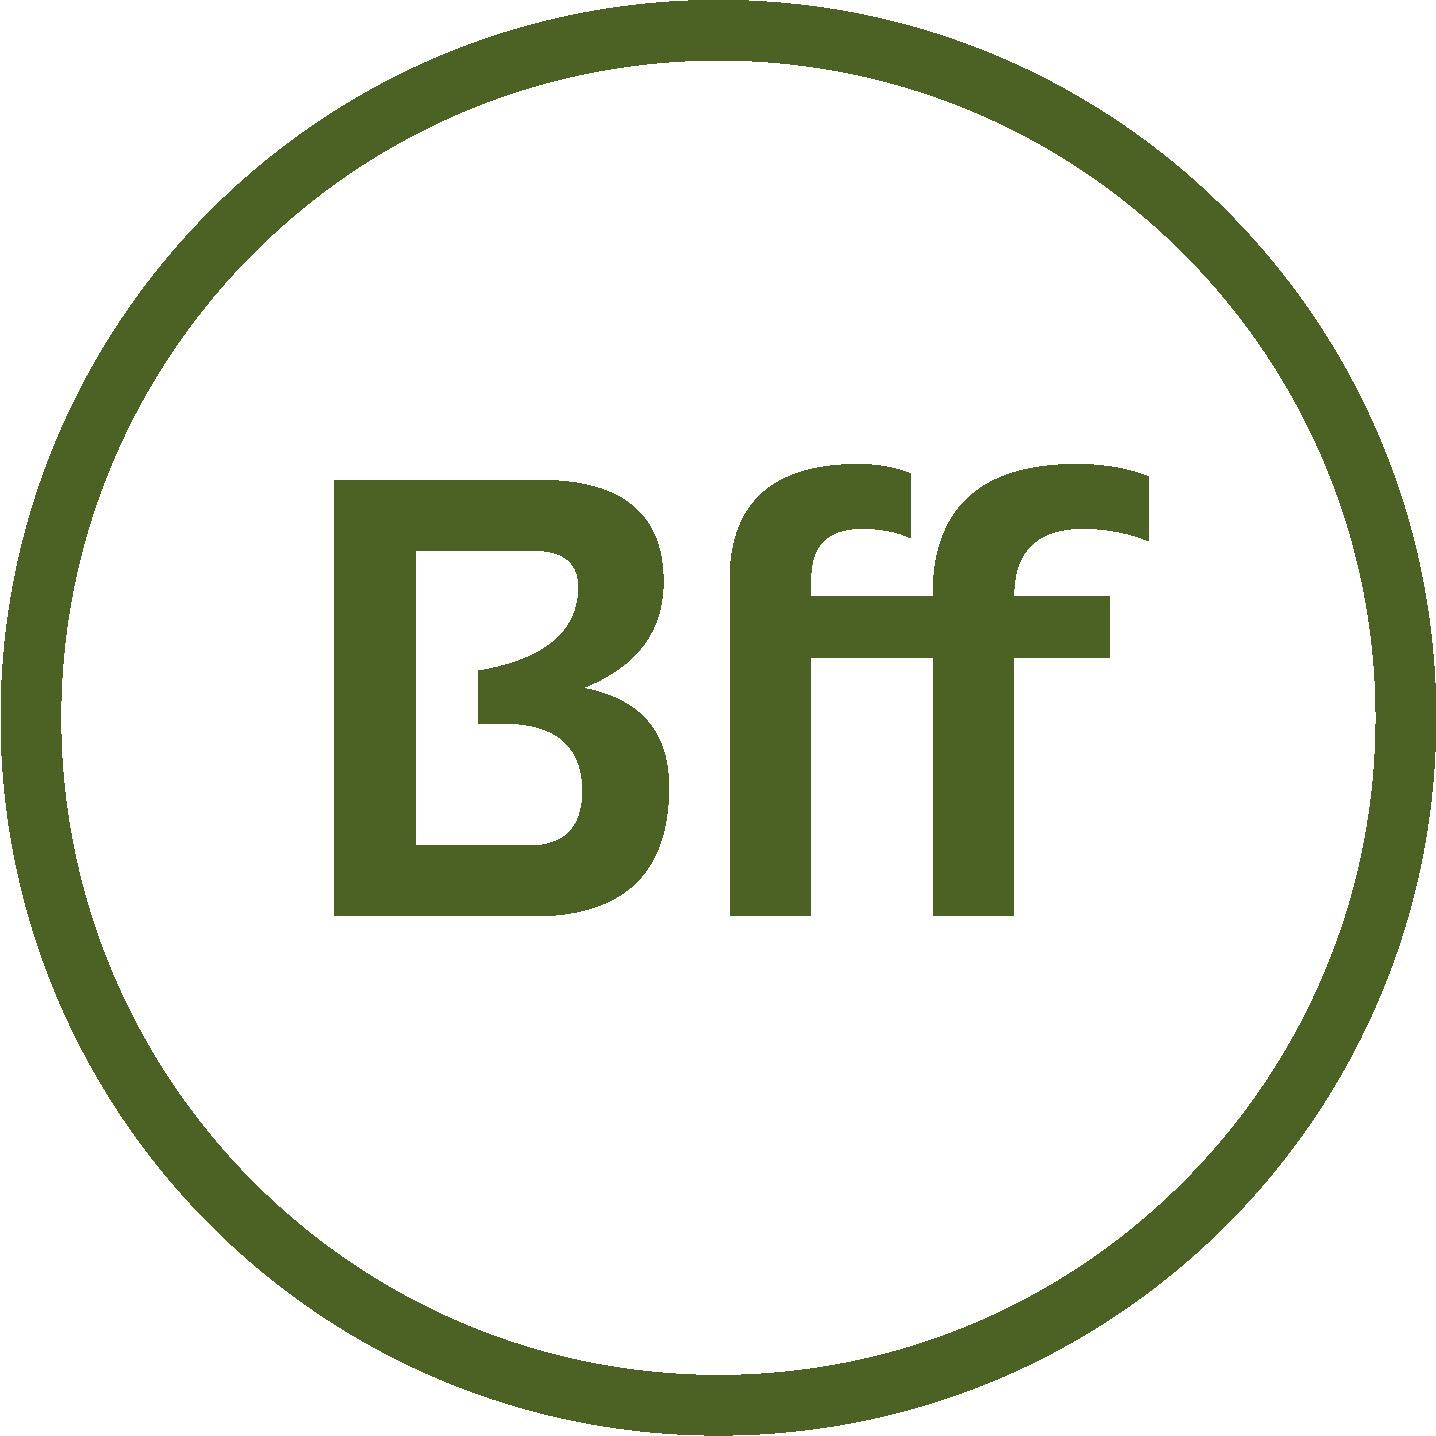 bff-browser-logo